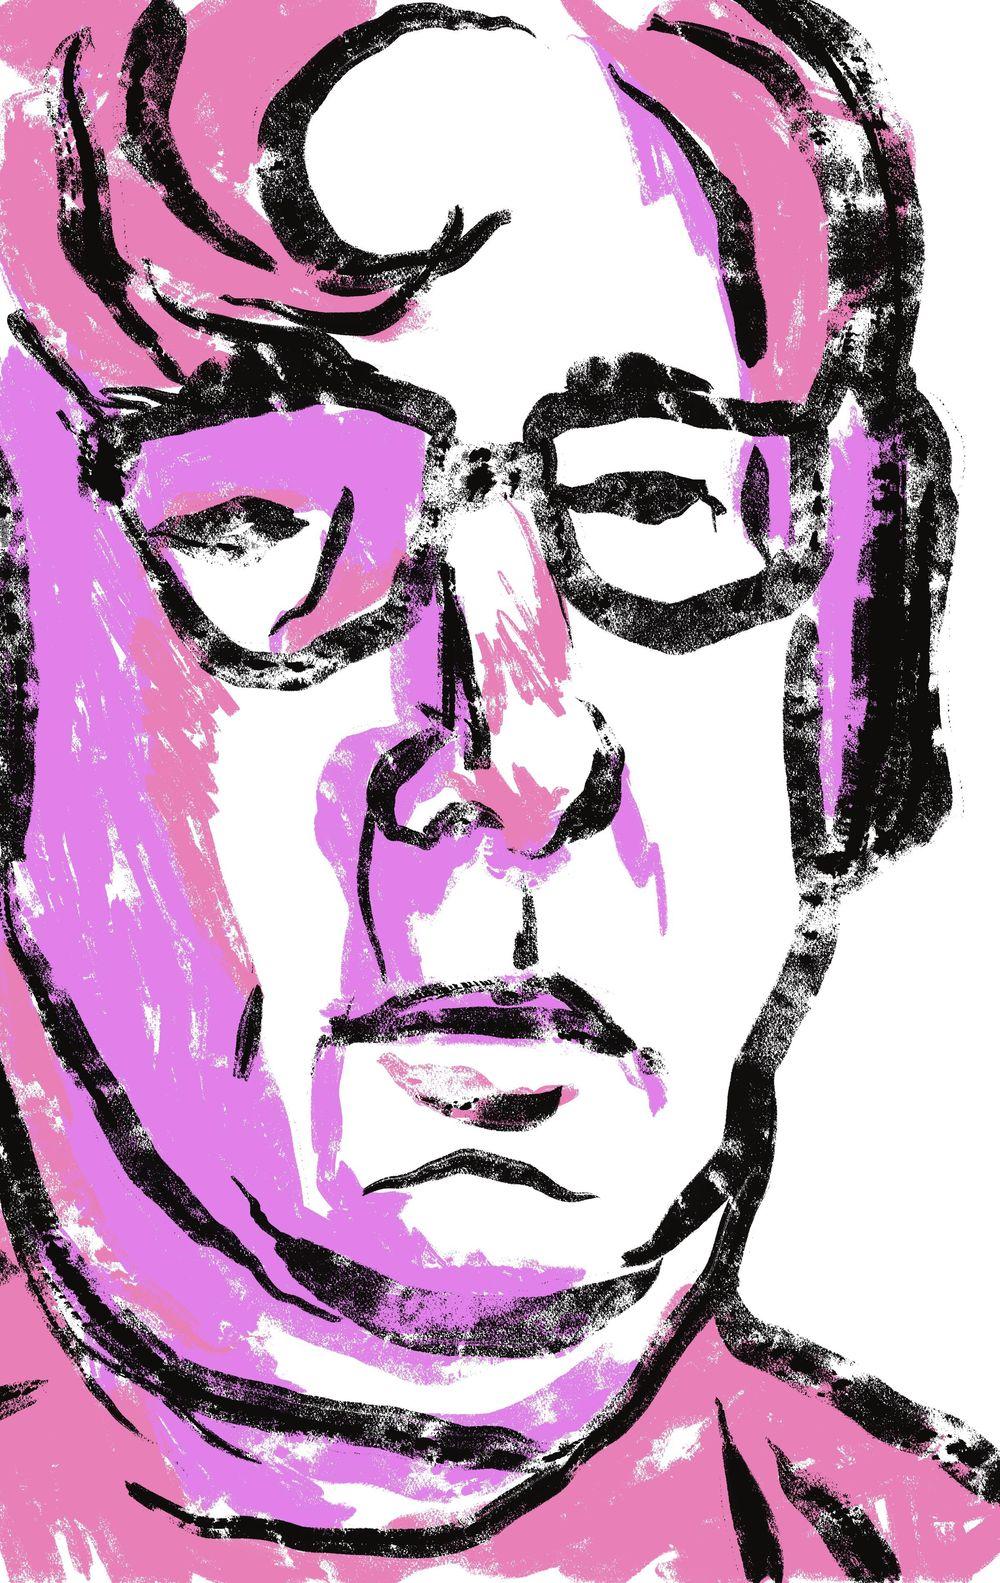 Self Portraits - image 1 - student project